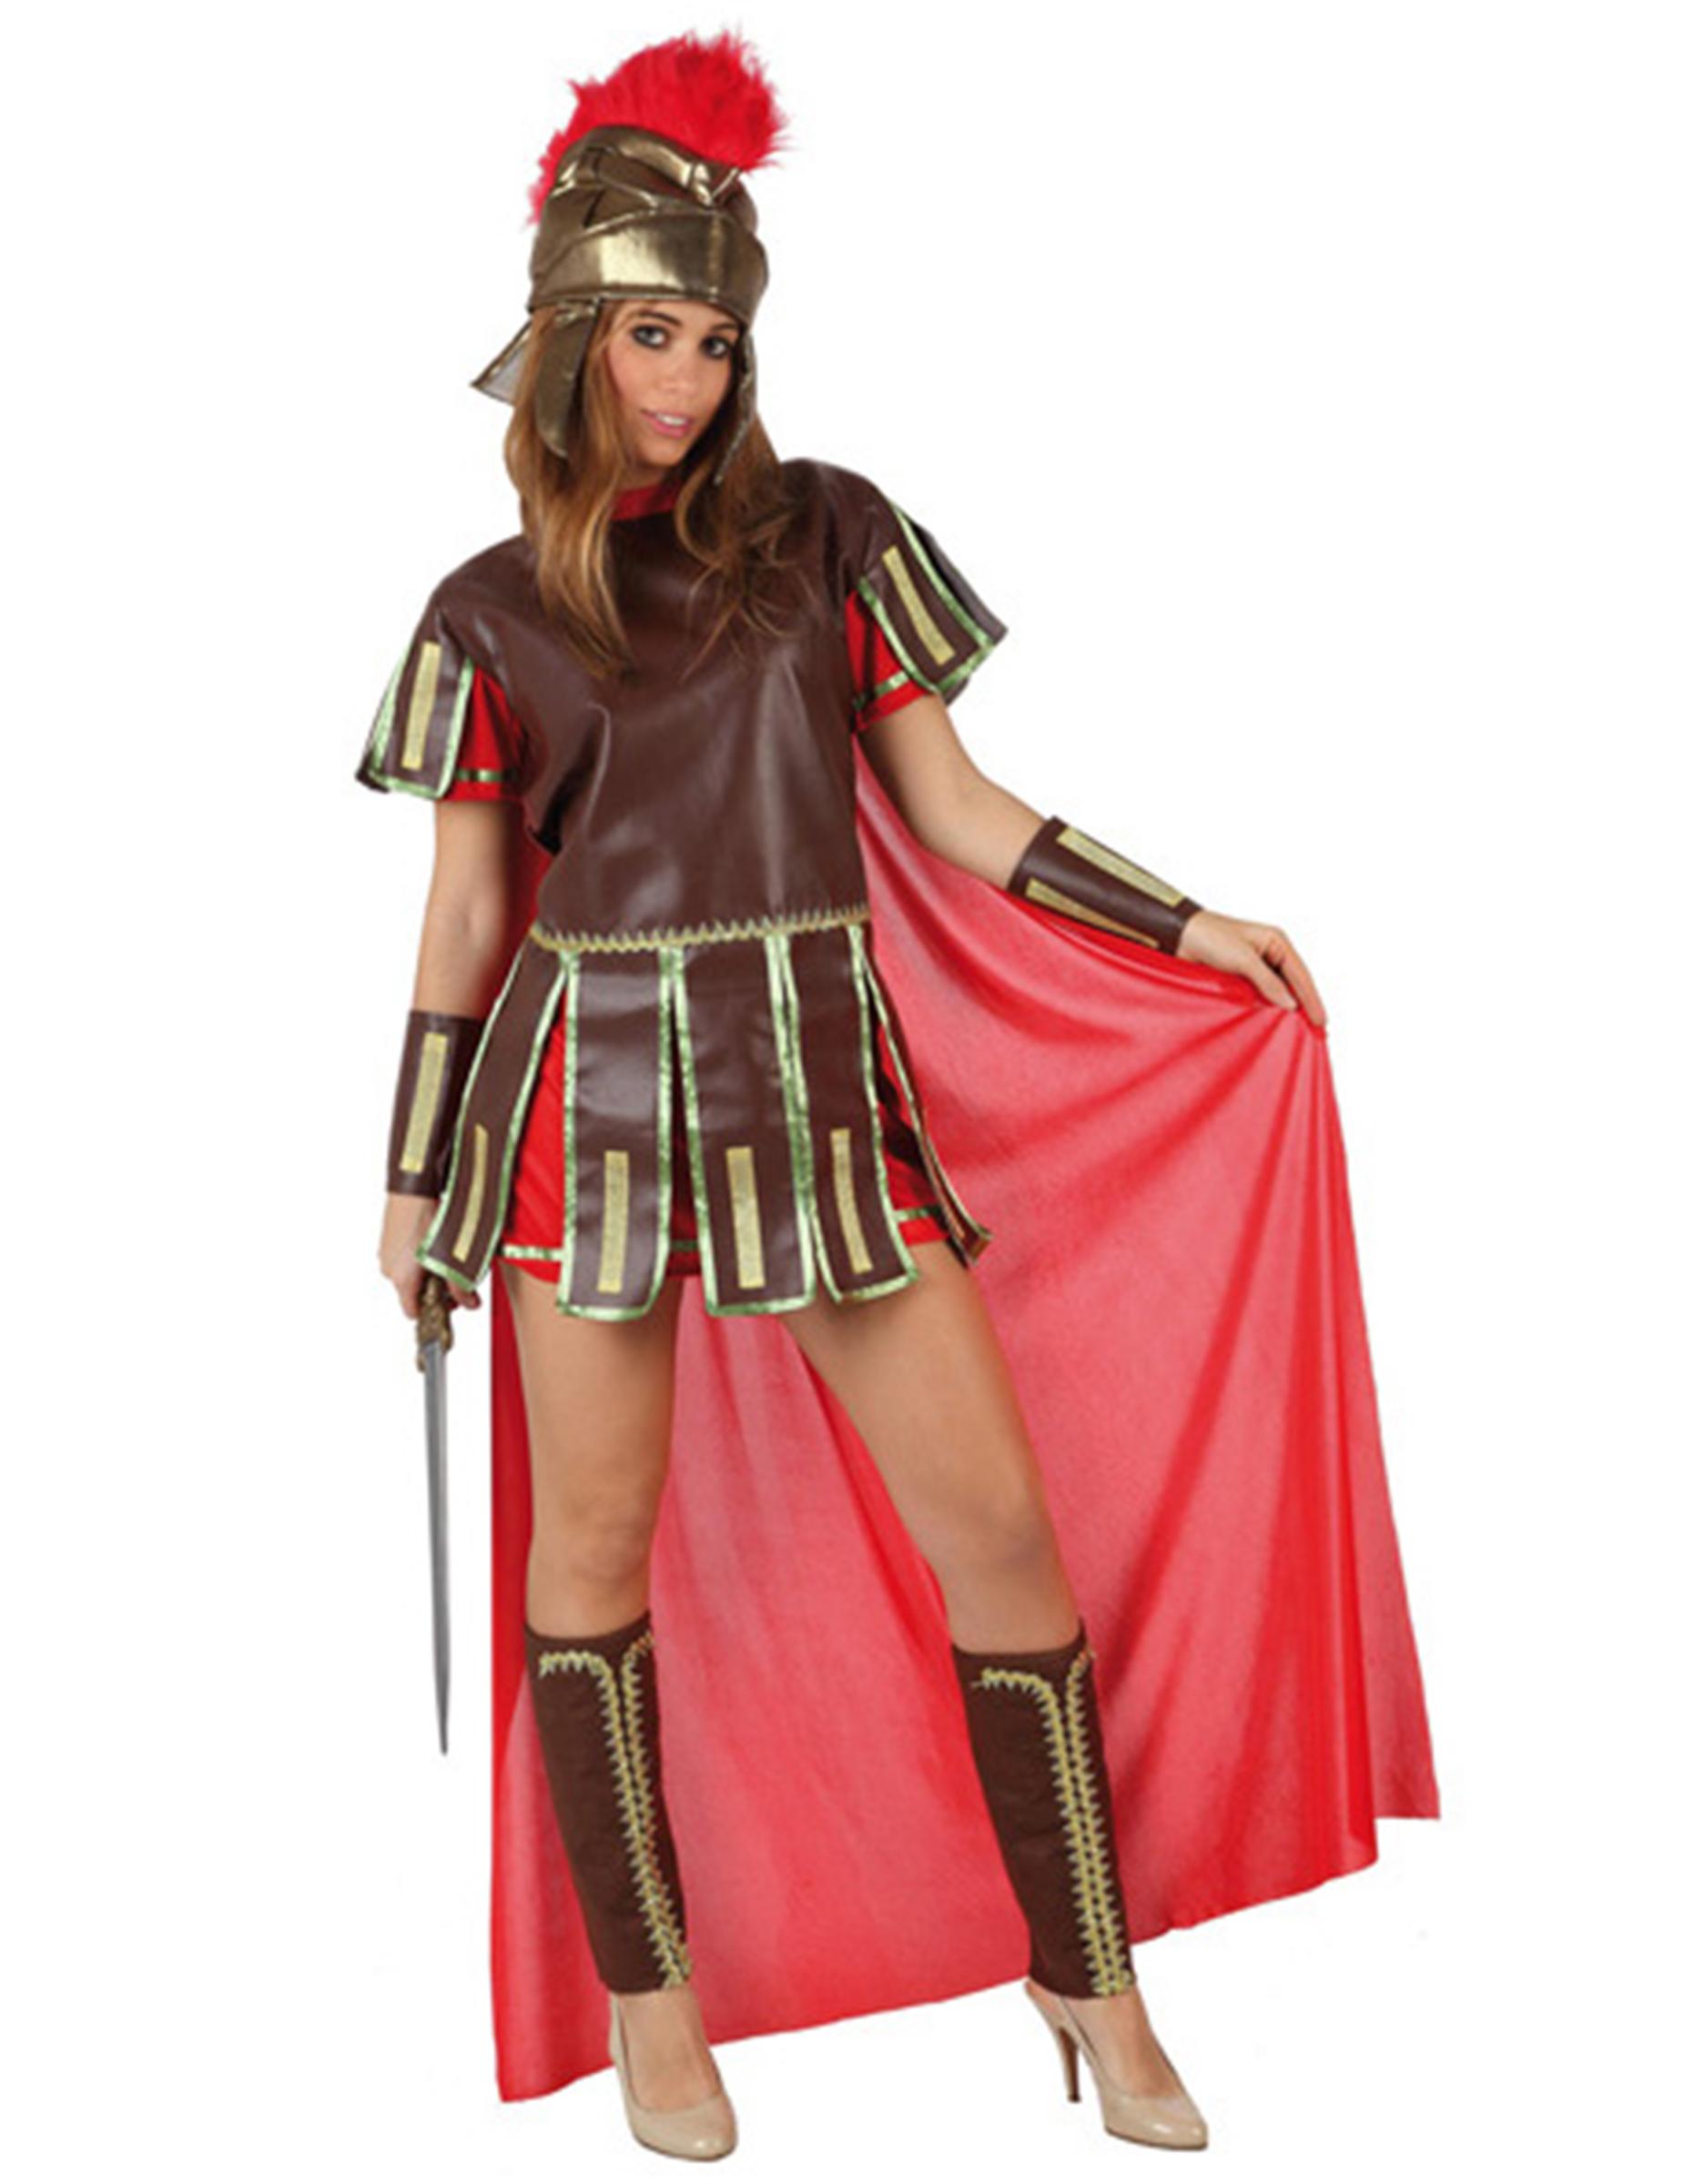 roman centurion costume for women. Black Bedroom Furniture Sets. Home Design Ideas